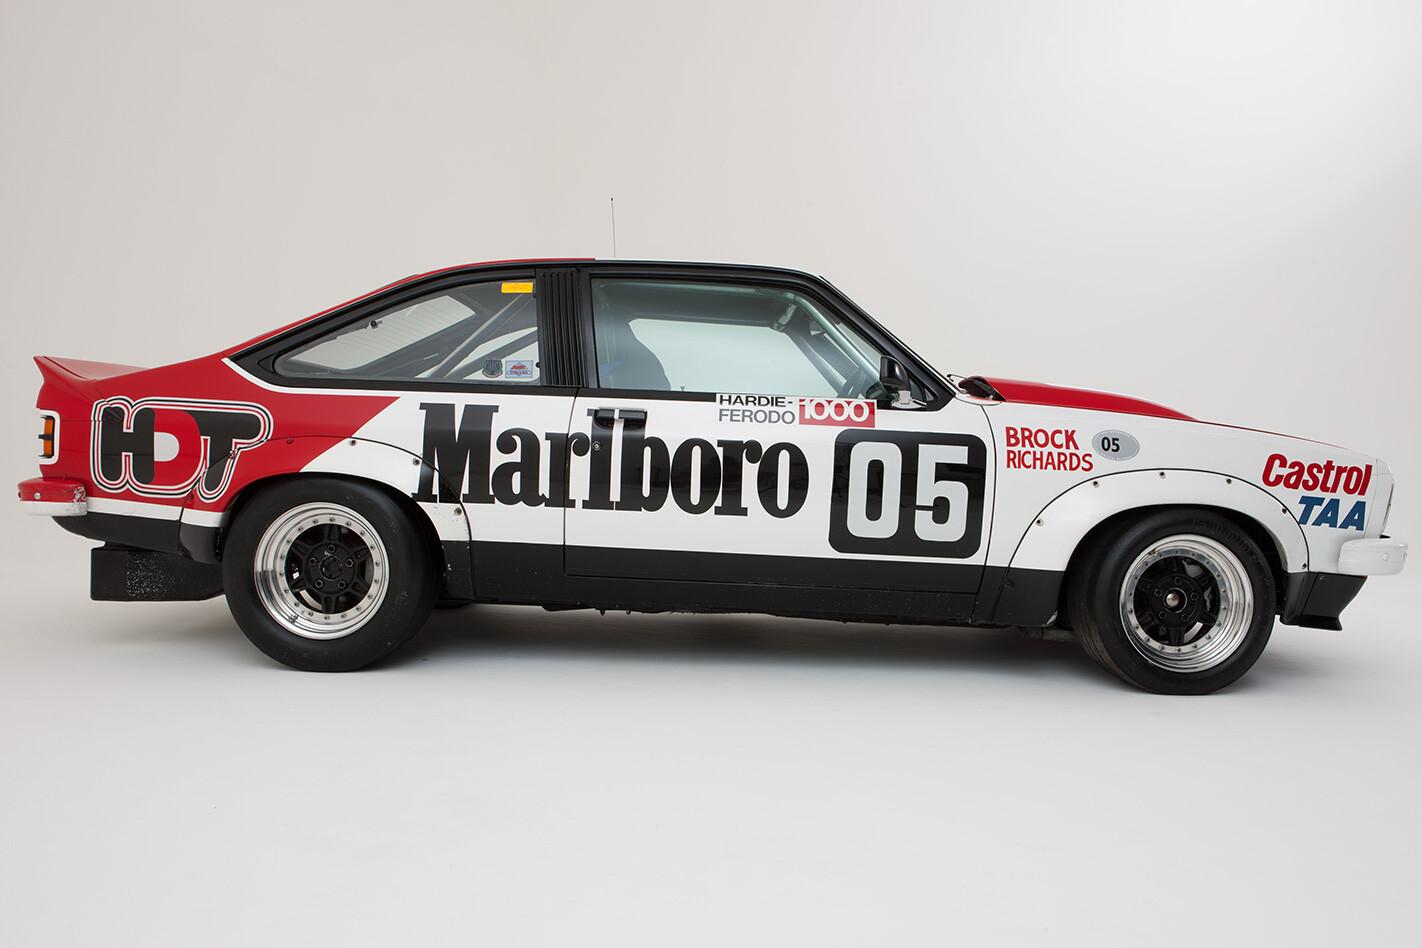 1978 HDT Torana A9X side